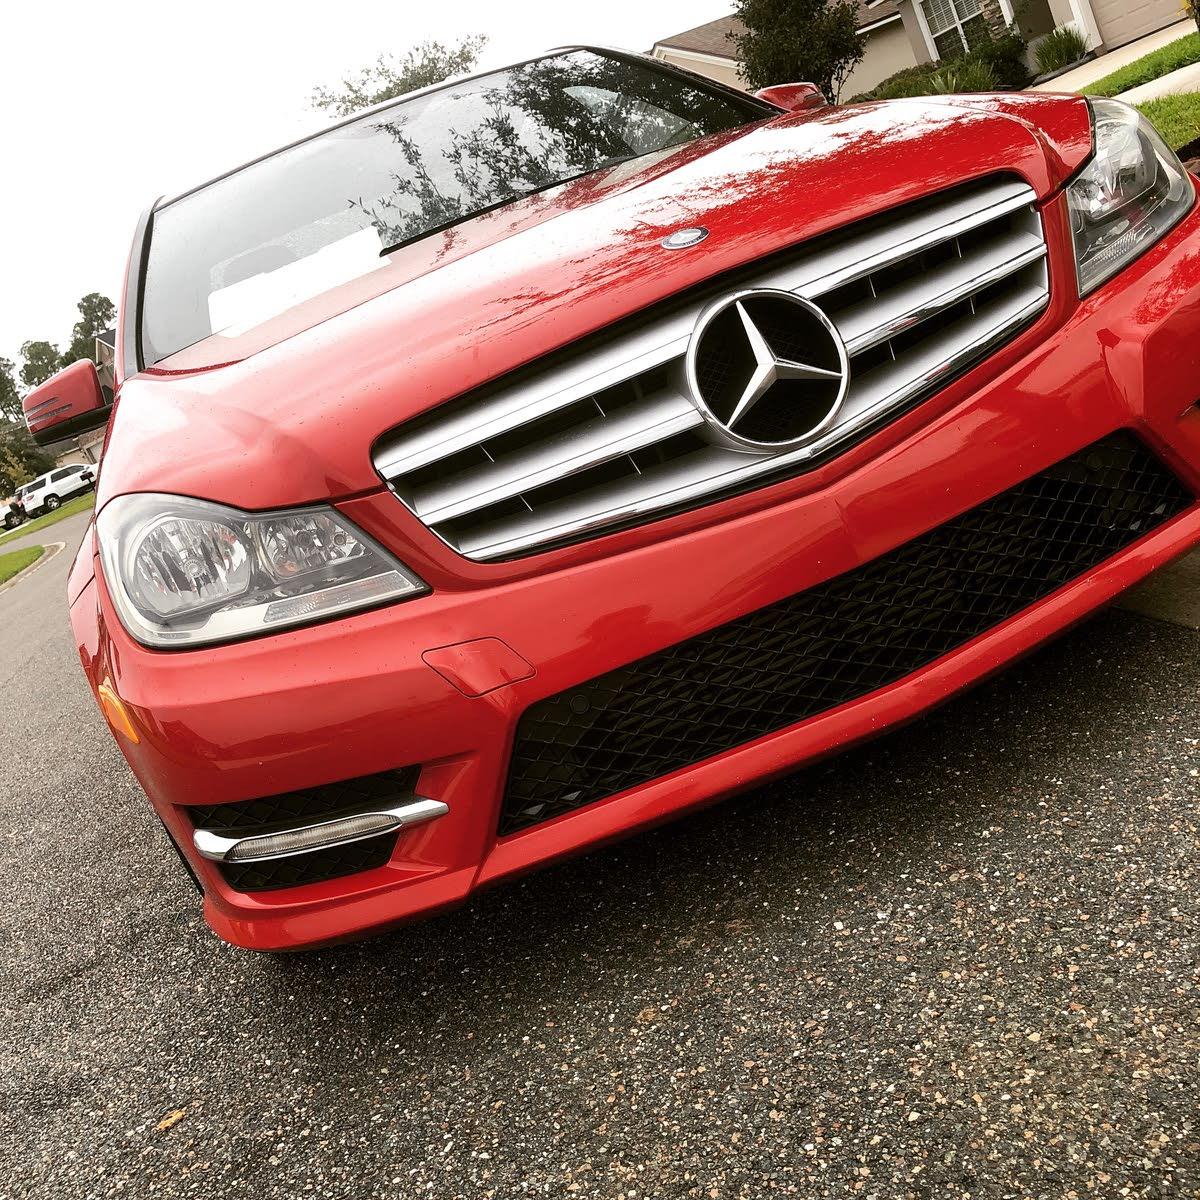 Mercedes-Benz C-Class Questions - Random rough idle/vibration